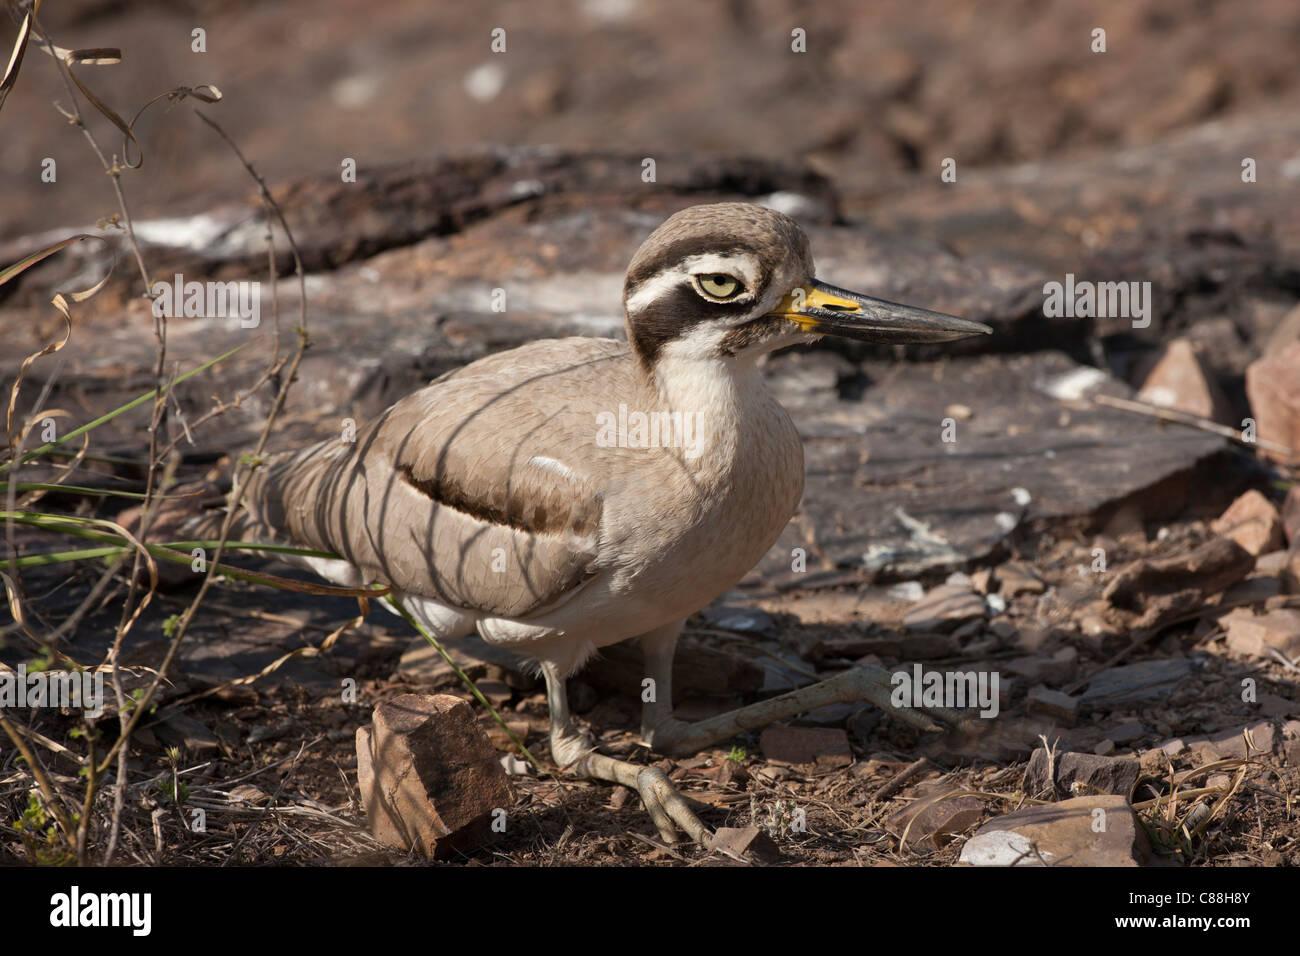 Indian Stone Plover bird, Burhinus oedicnemus indicus, in Ranthambhore National Park, Rajasthan, Northern India - Stock Image